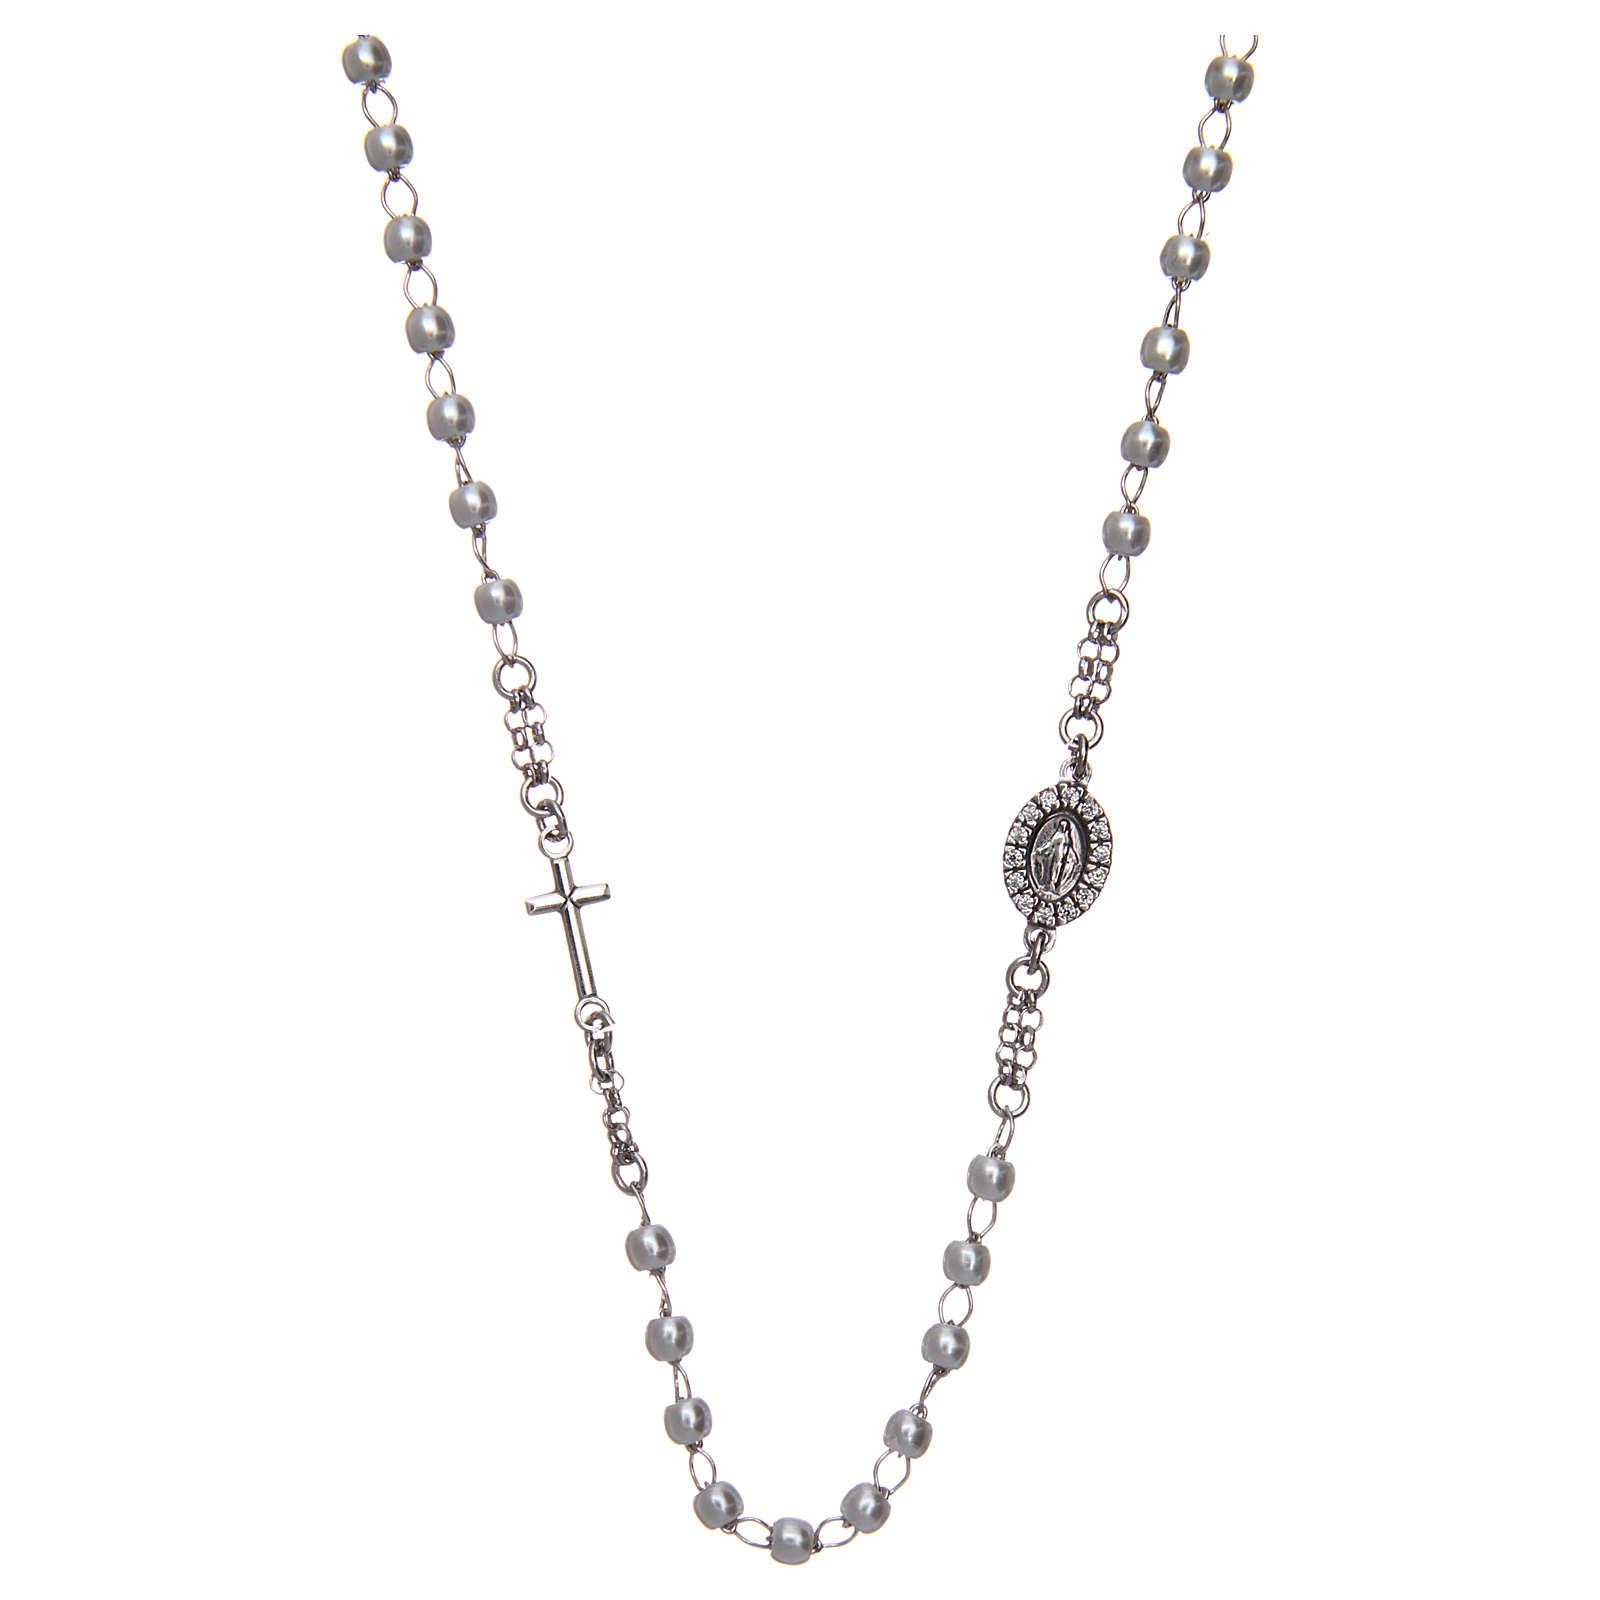 Rosary AMEN collar necklace Jubilee silver 925 Swarovski, Rhodium finish 4